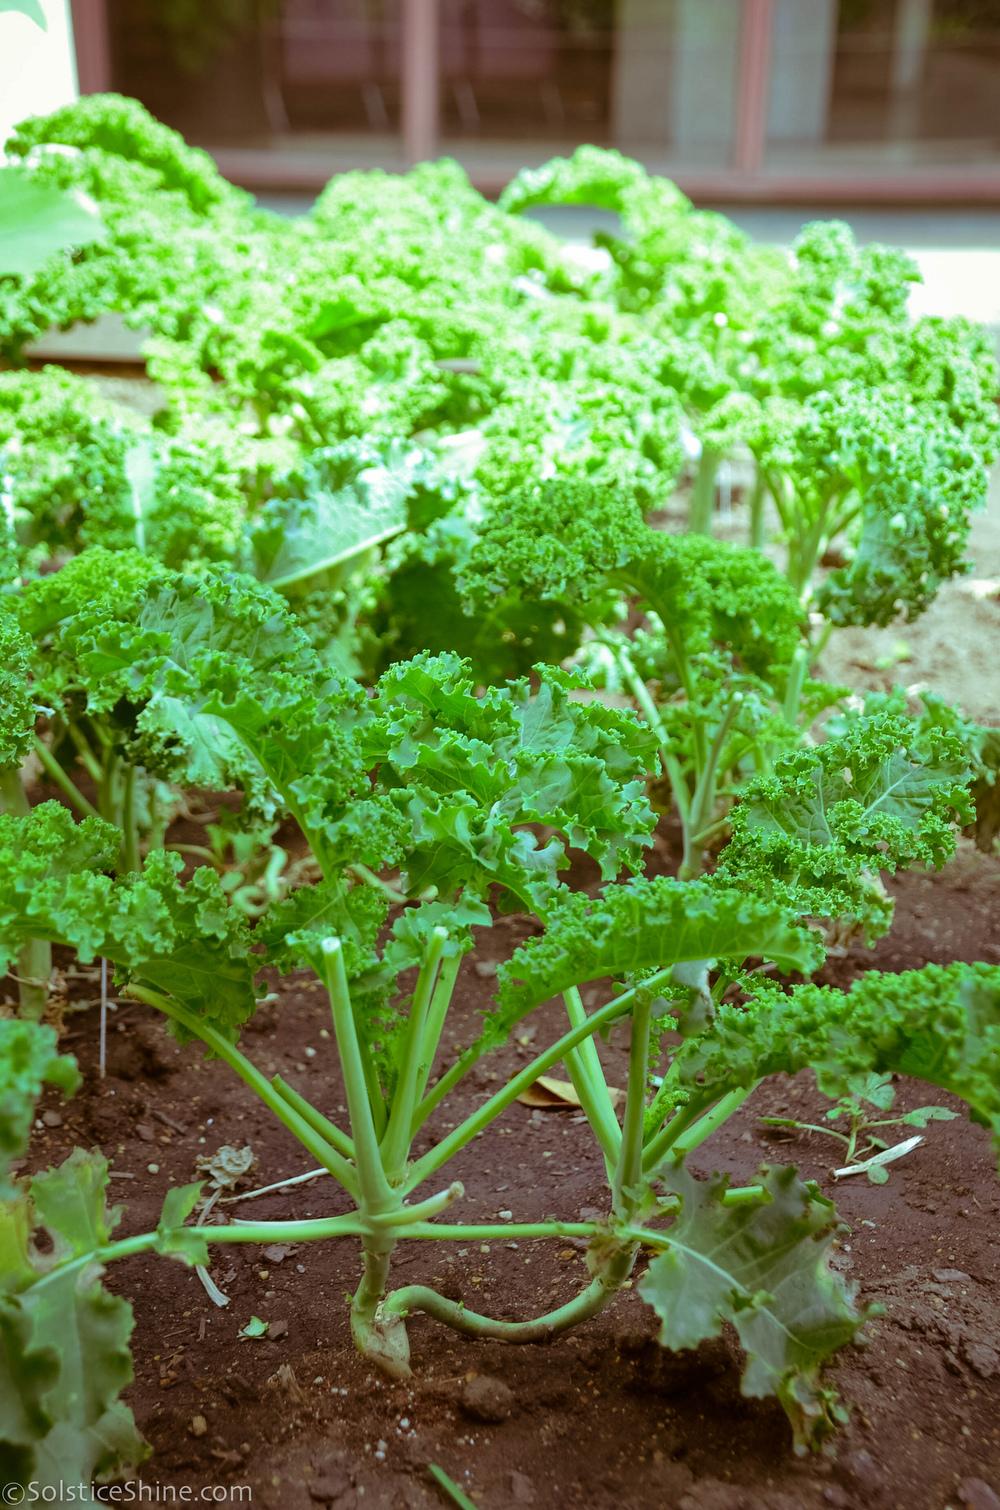 Curly leaf kale